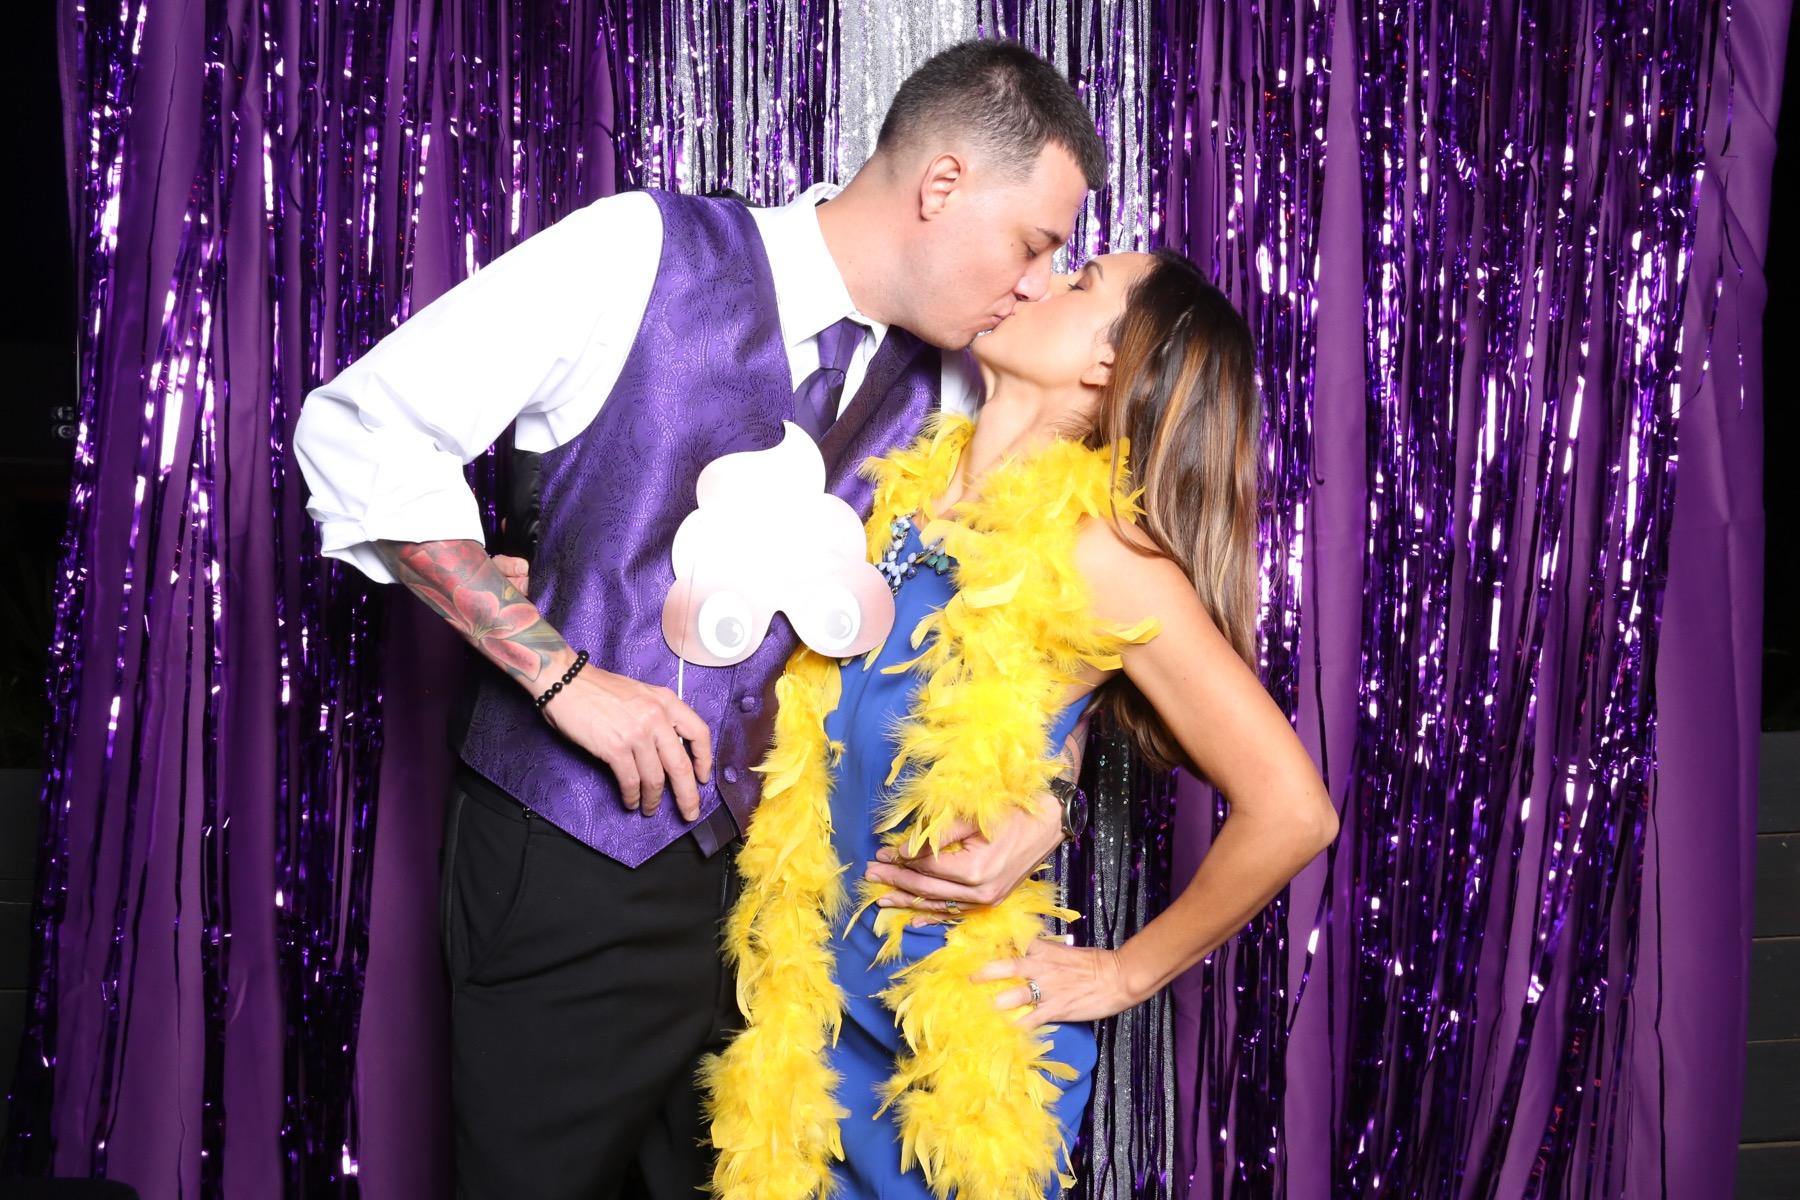 Booth Chamber Photo Booth Harmony Gardens wedding antoine Hart de leon springs photography_75.jpeg